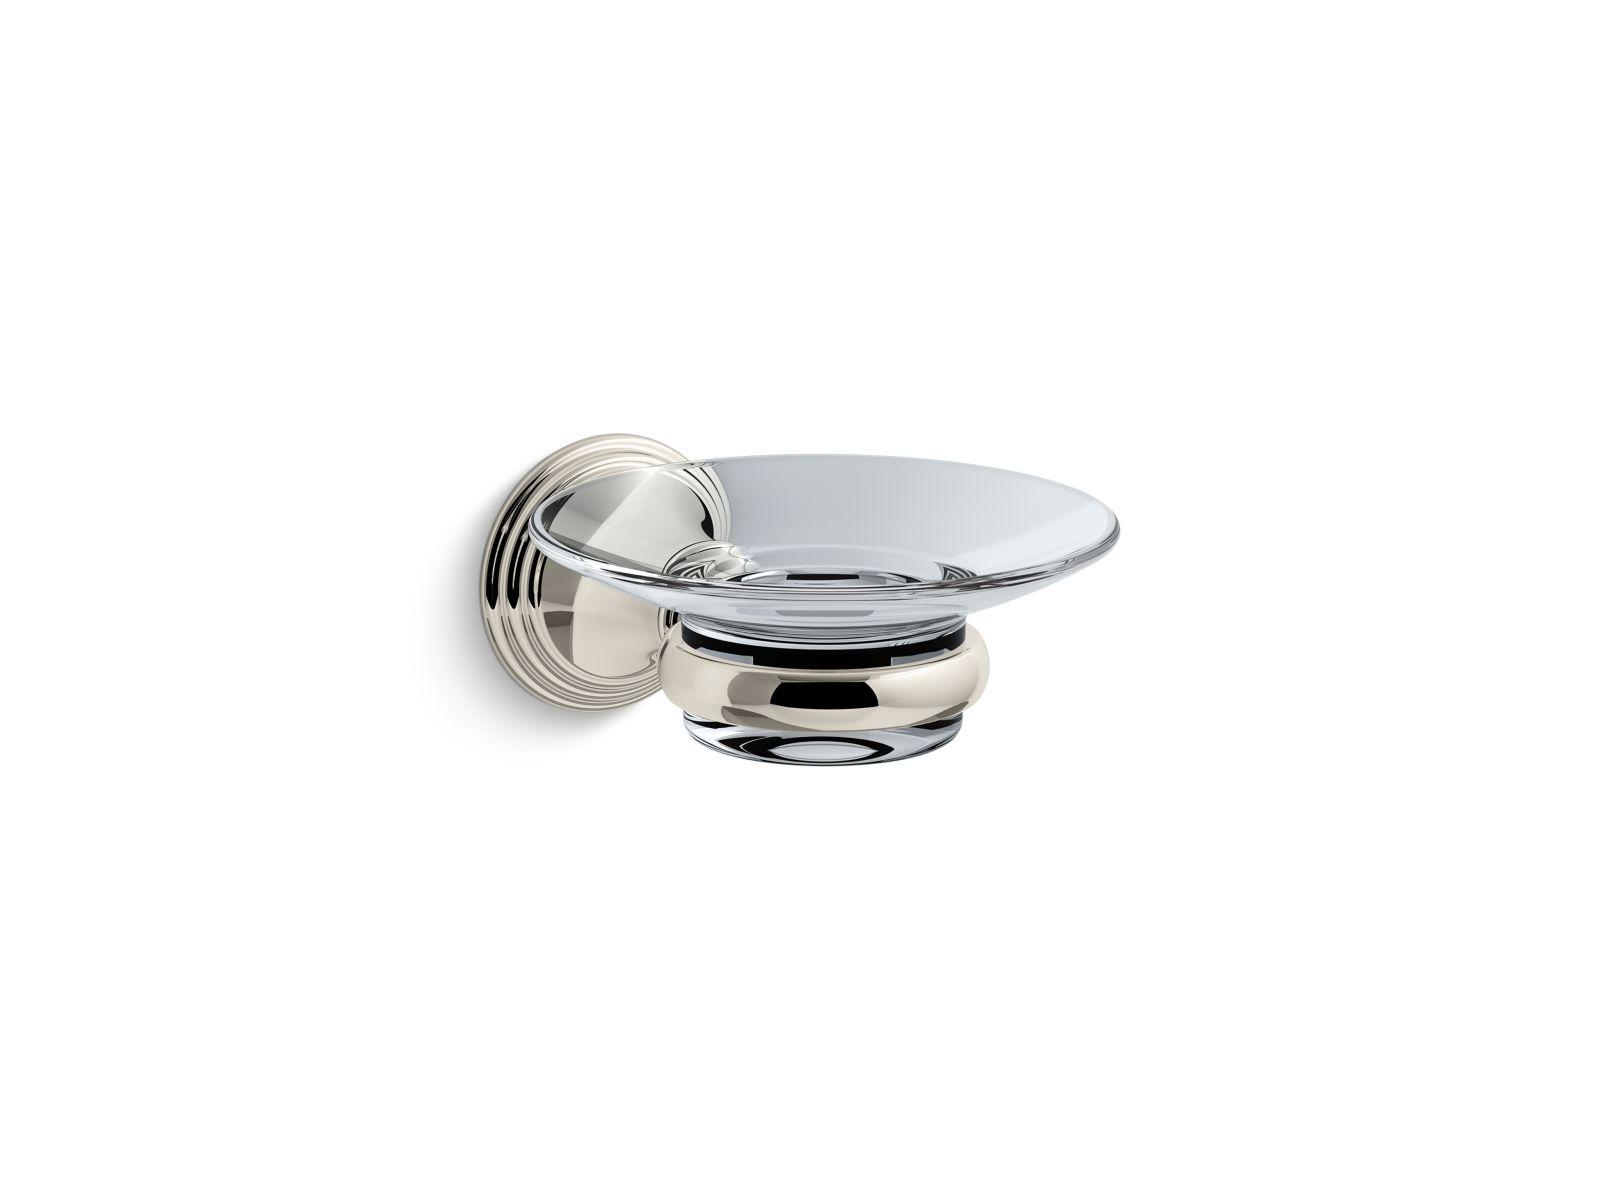 Kohler Devonshire® K-10560-SN Soap dish Vibrant Polished Nickel